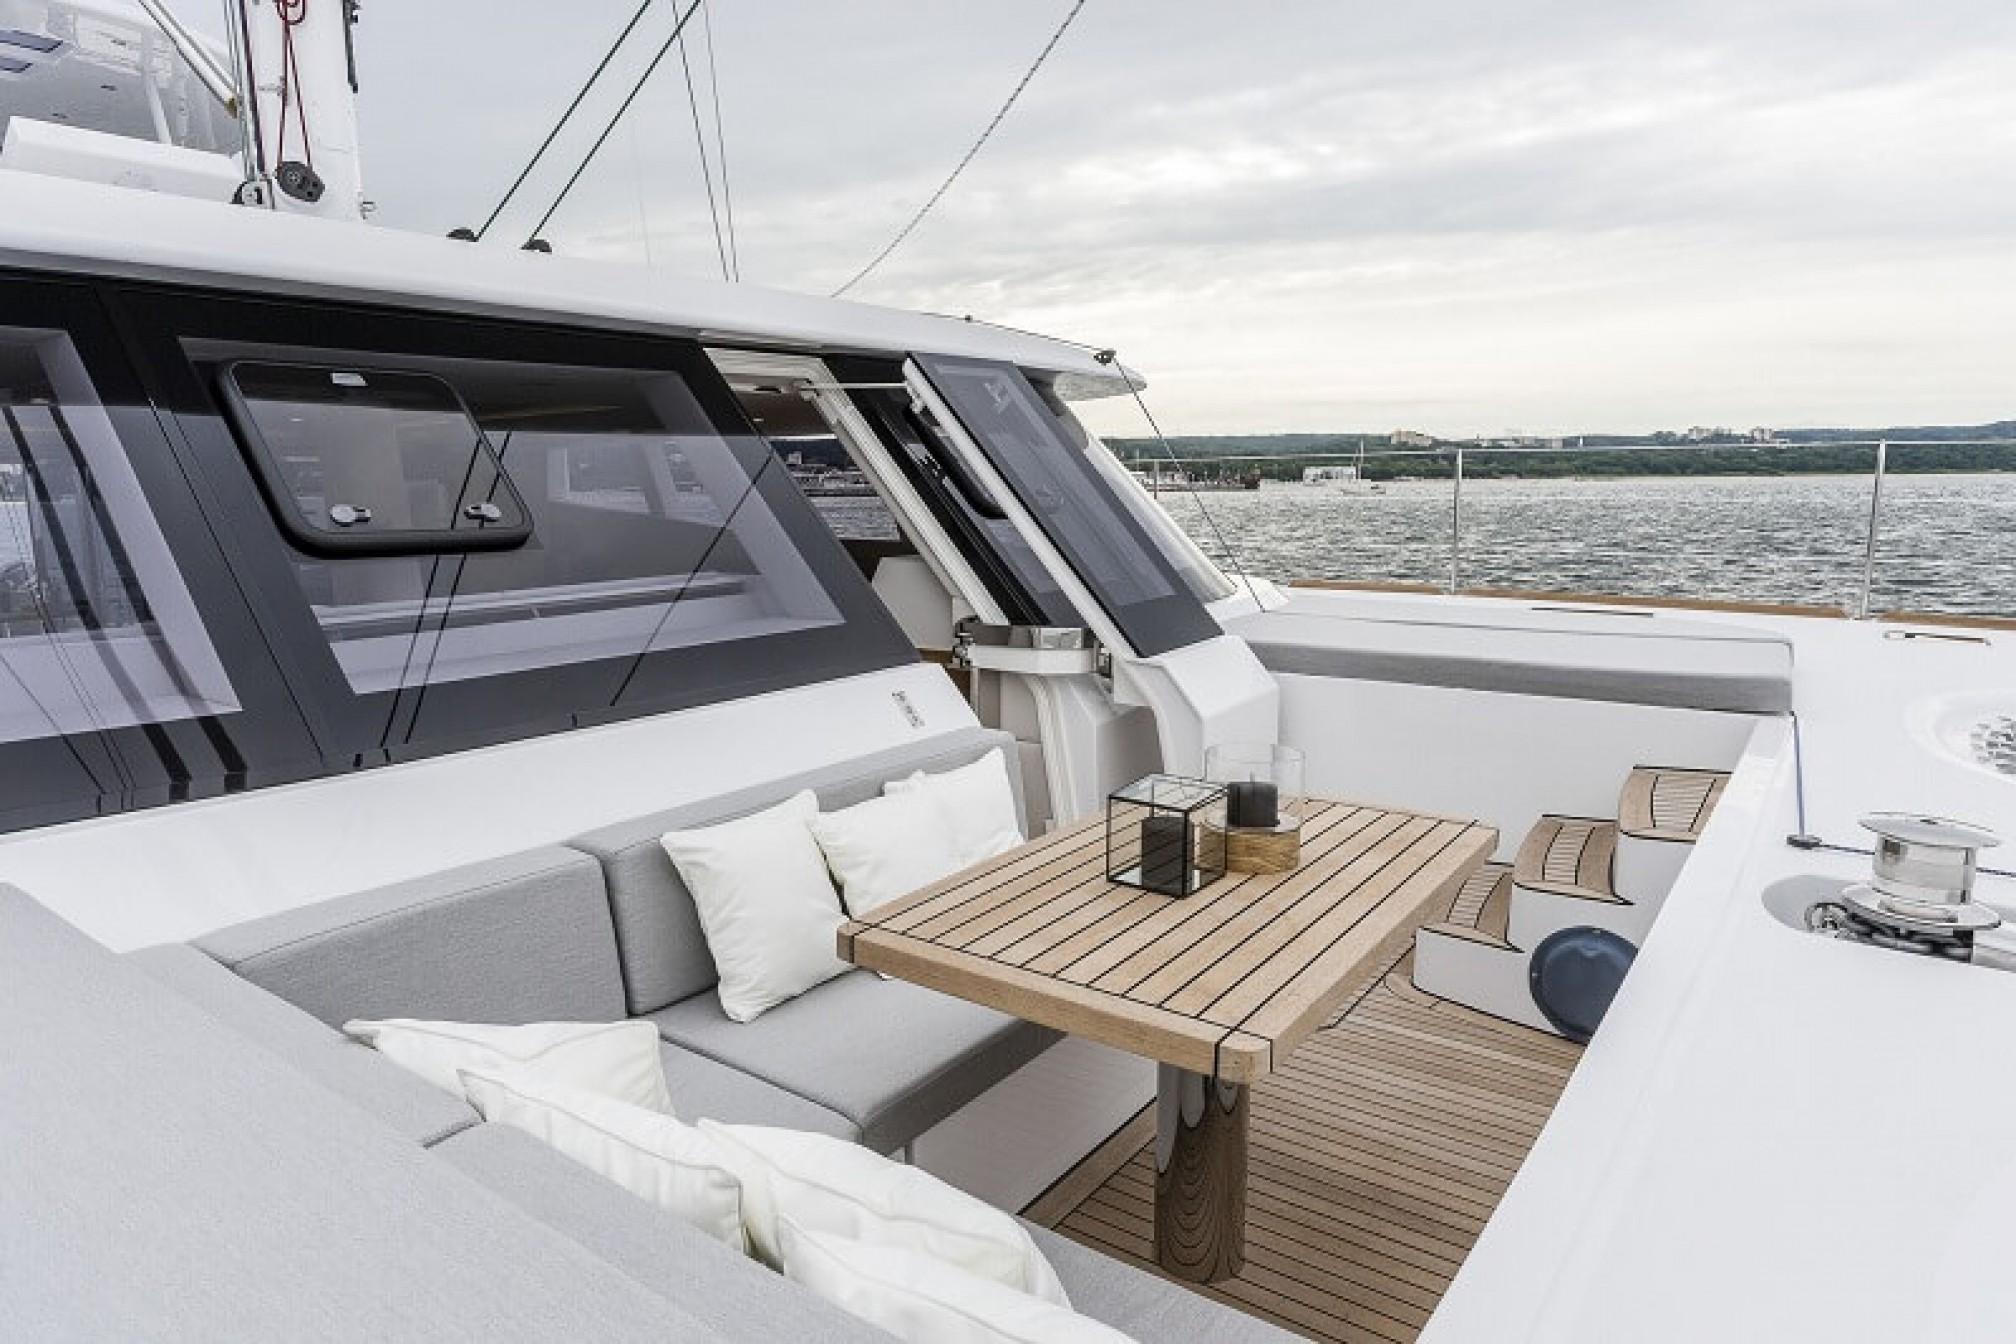 Sunreef 74 'CALMAO' catamaran charter deck